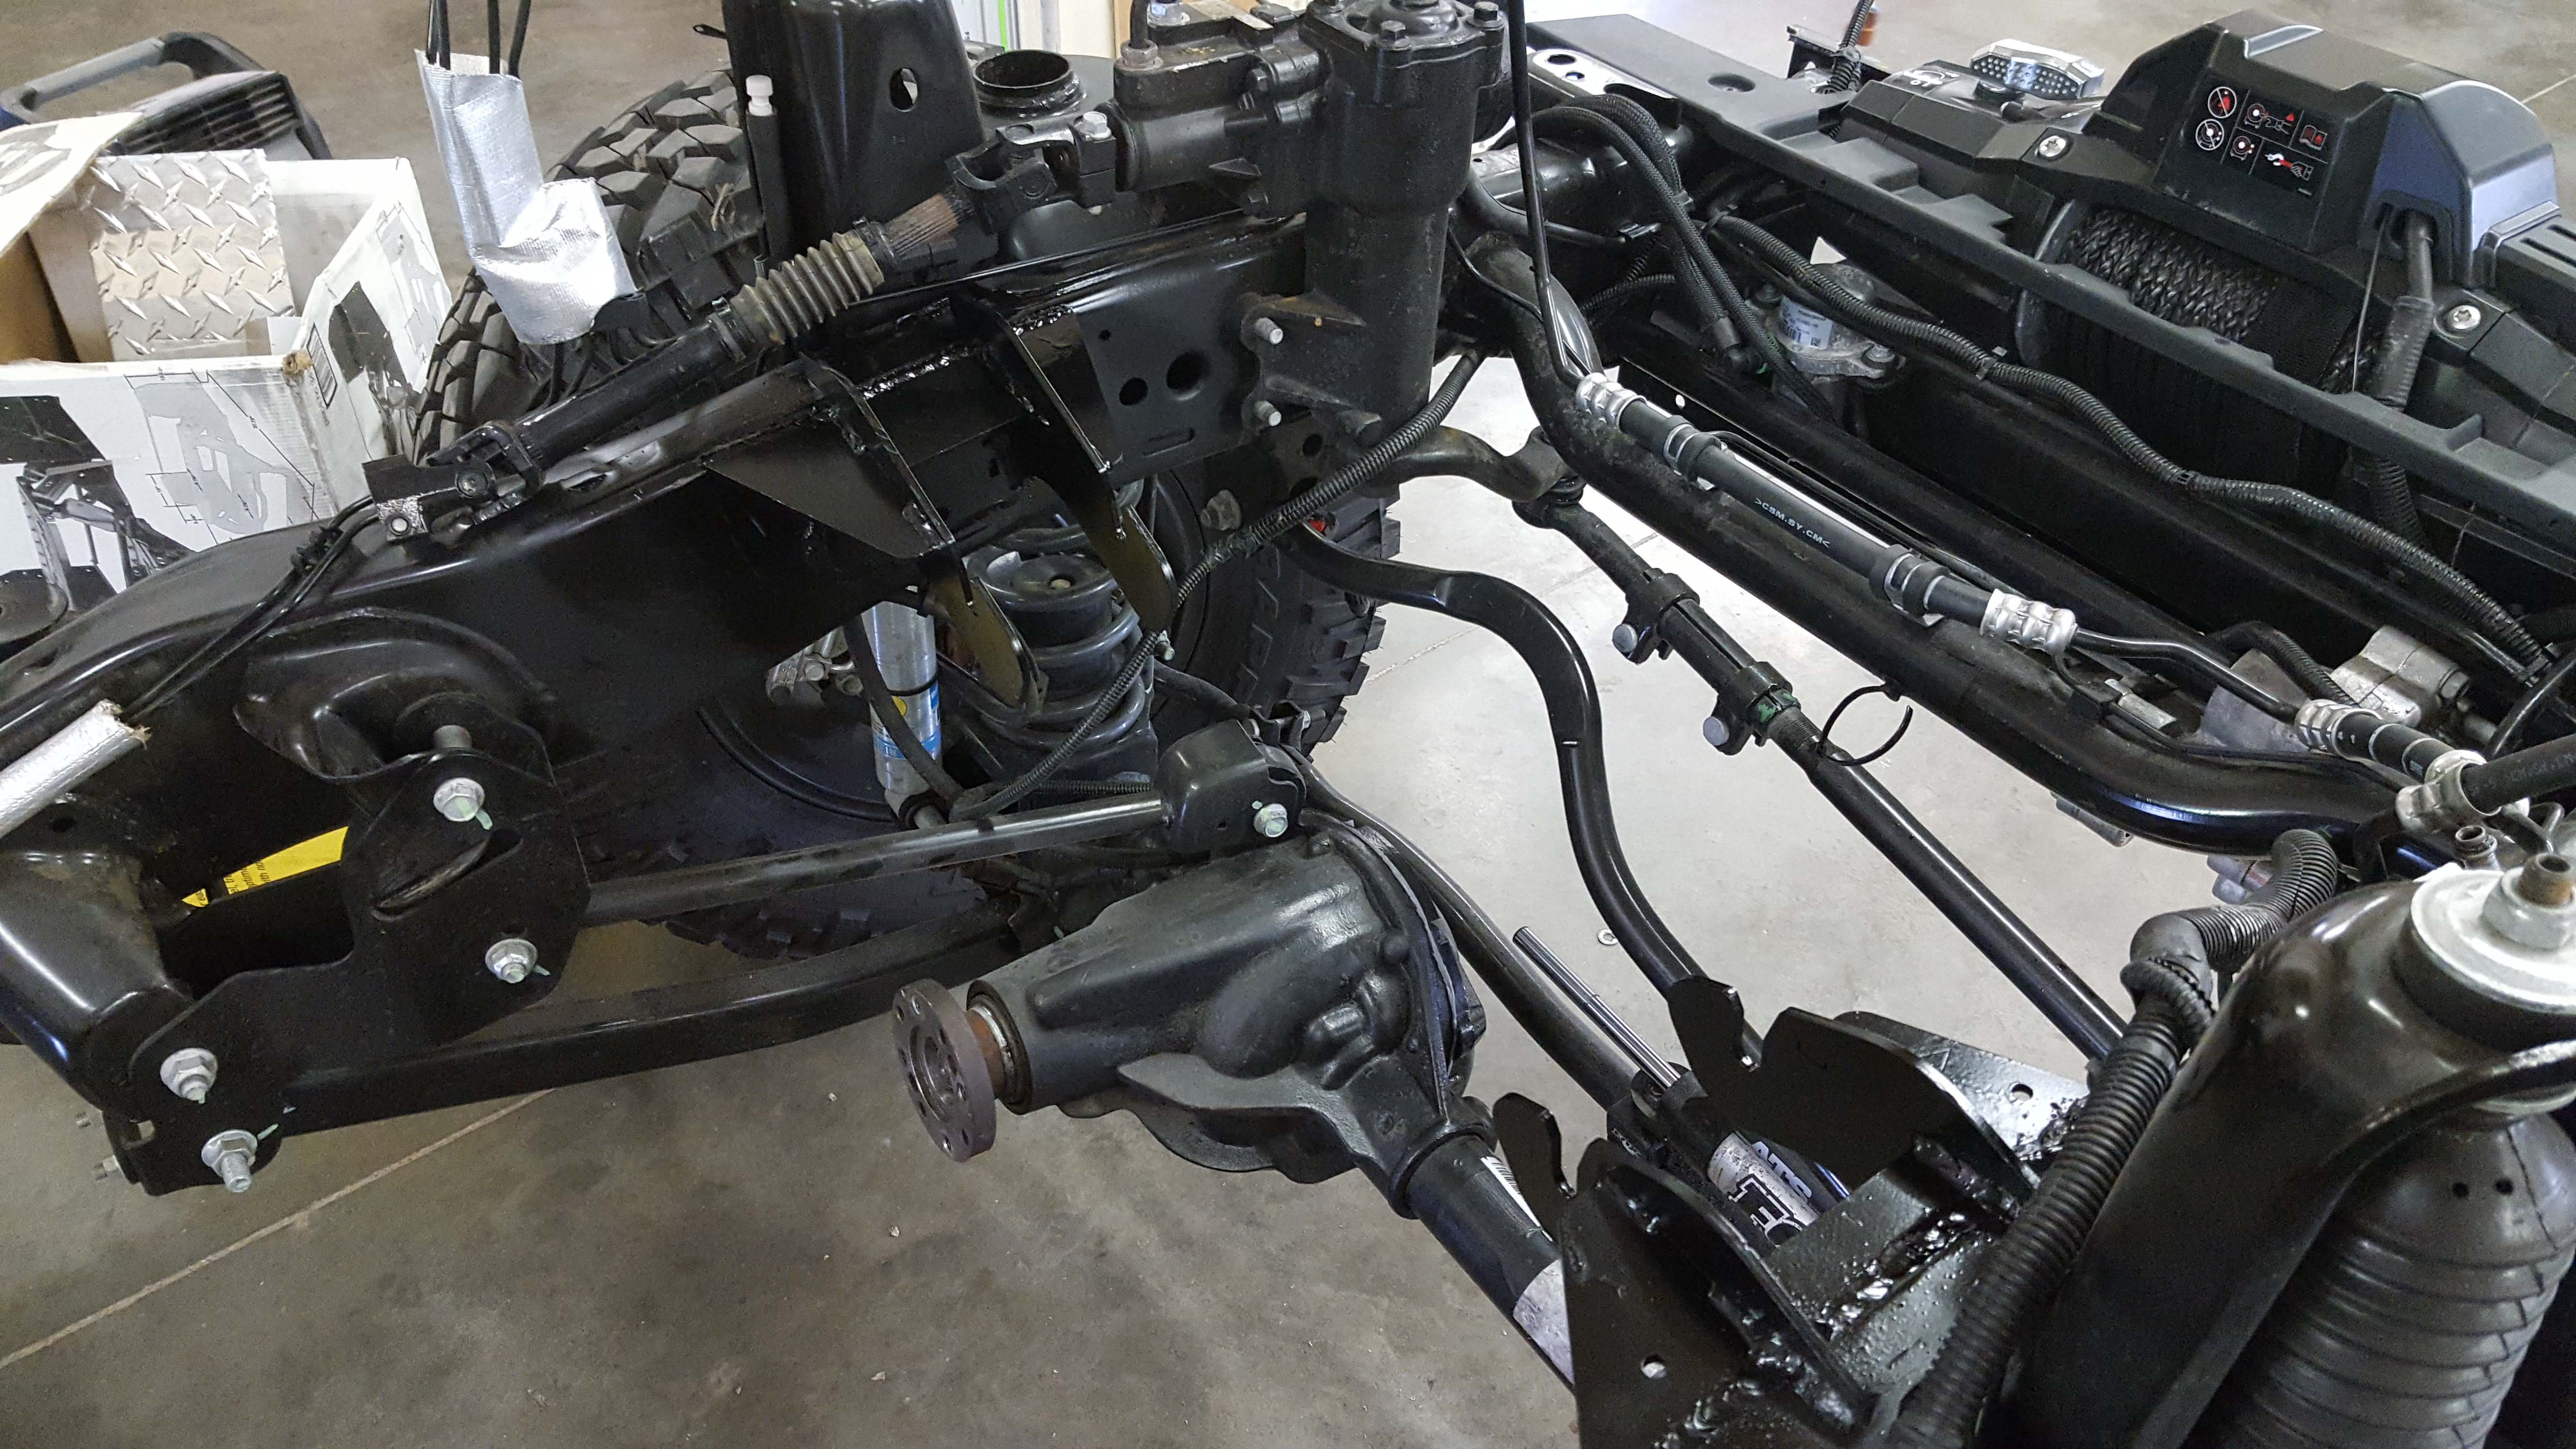 Jk Hemi Conversion Kit Nuthouse Industries Cool Tech Jeep Wiring Harness Swap Cincinnati Ohio